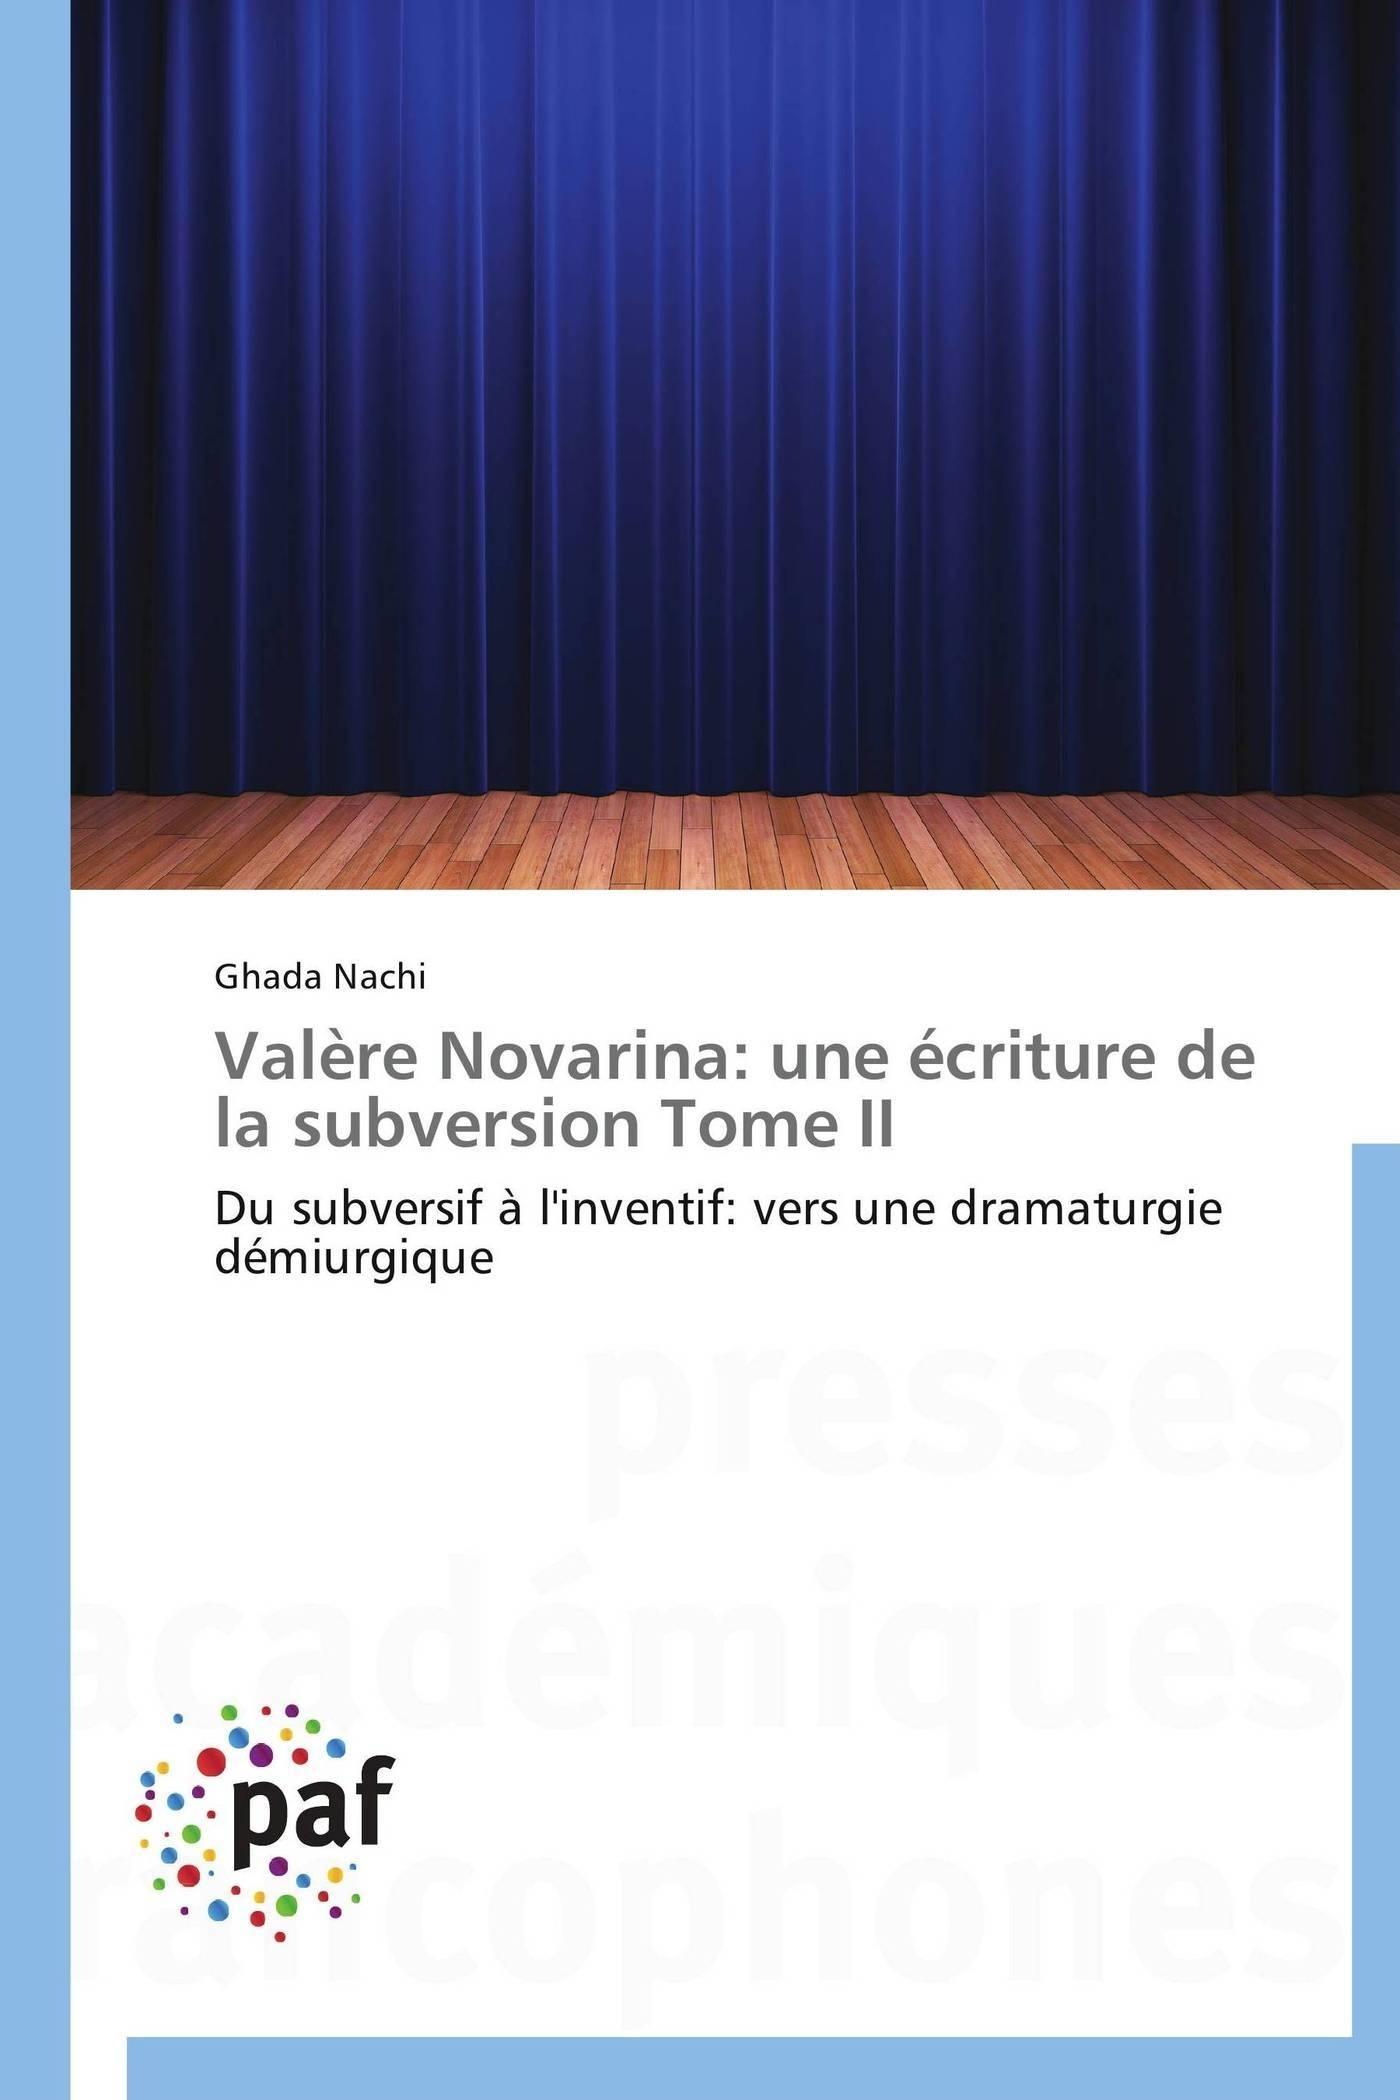 VALERE NOVARINA: UNE ECRITURE DE LA SUBVERSION TOME II